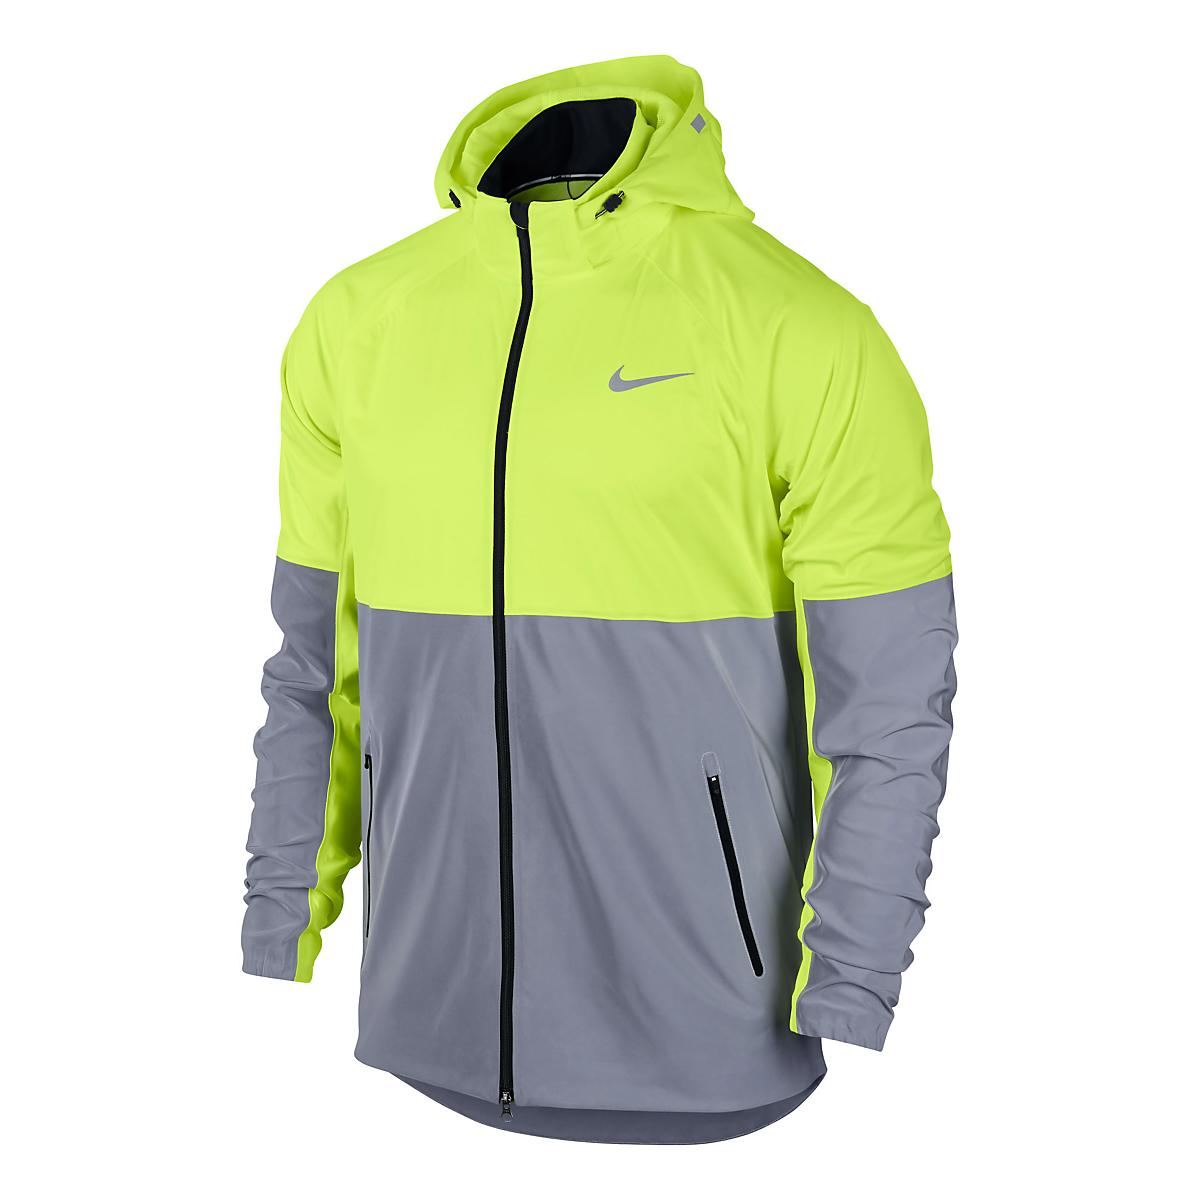 Nike element jacket men's - Nike Element Jacket Men's 43